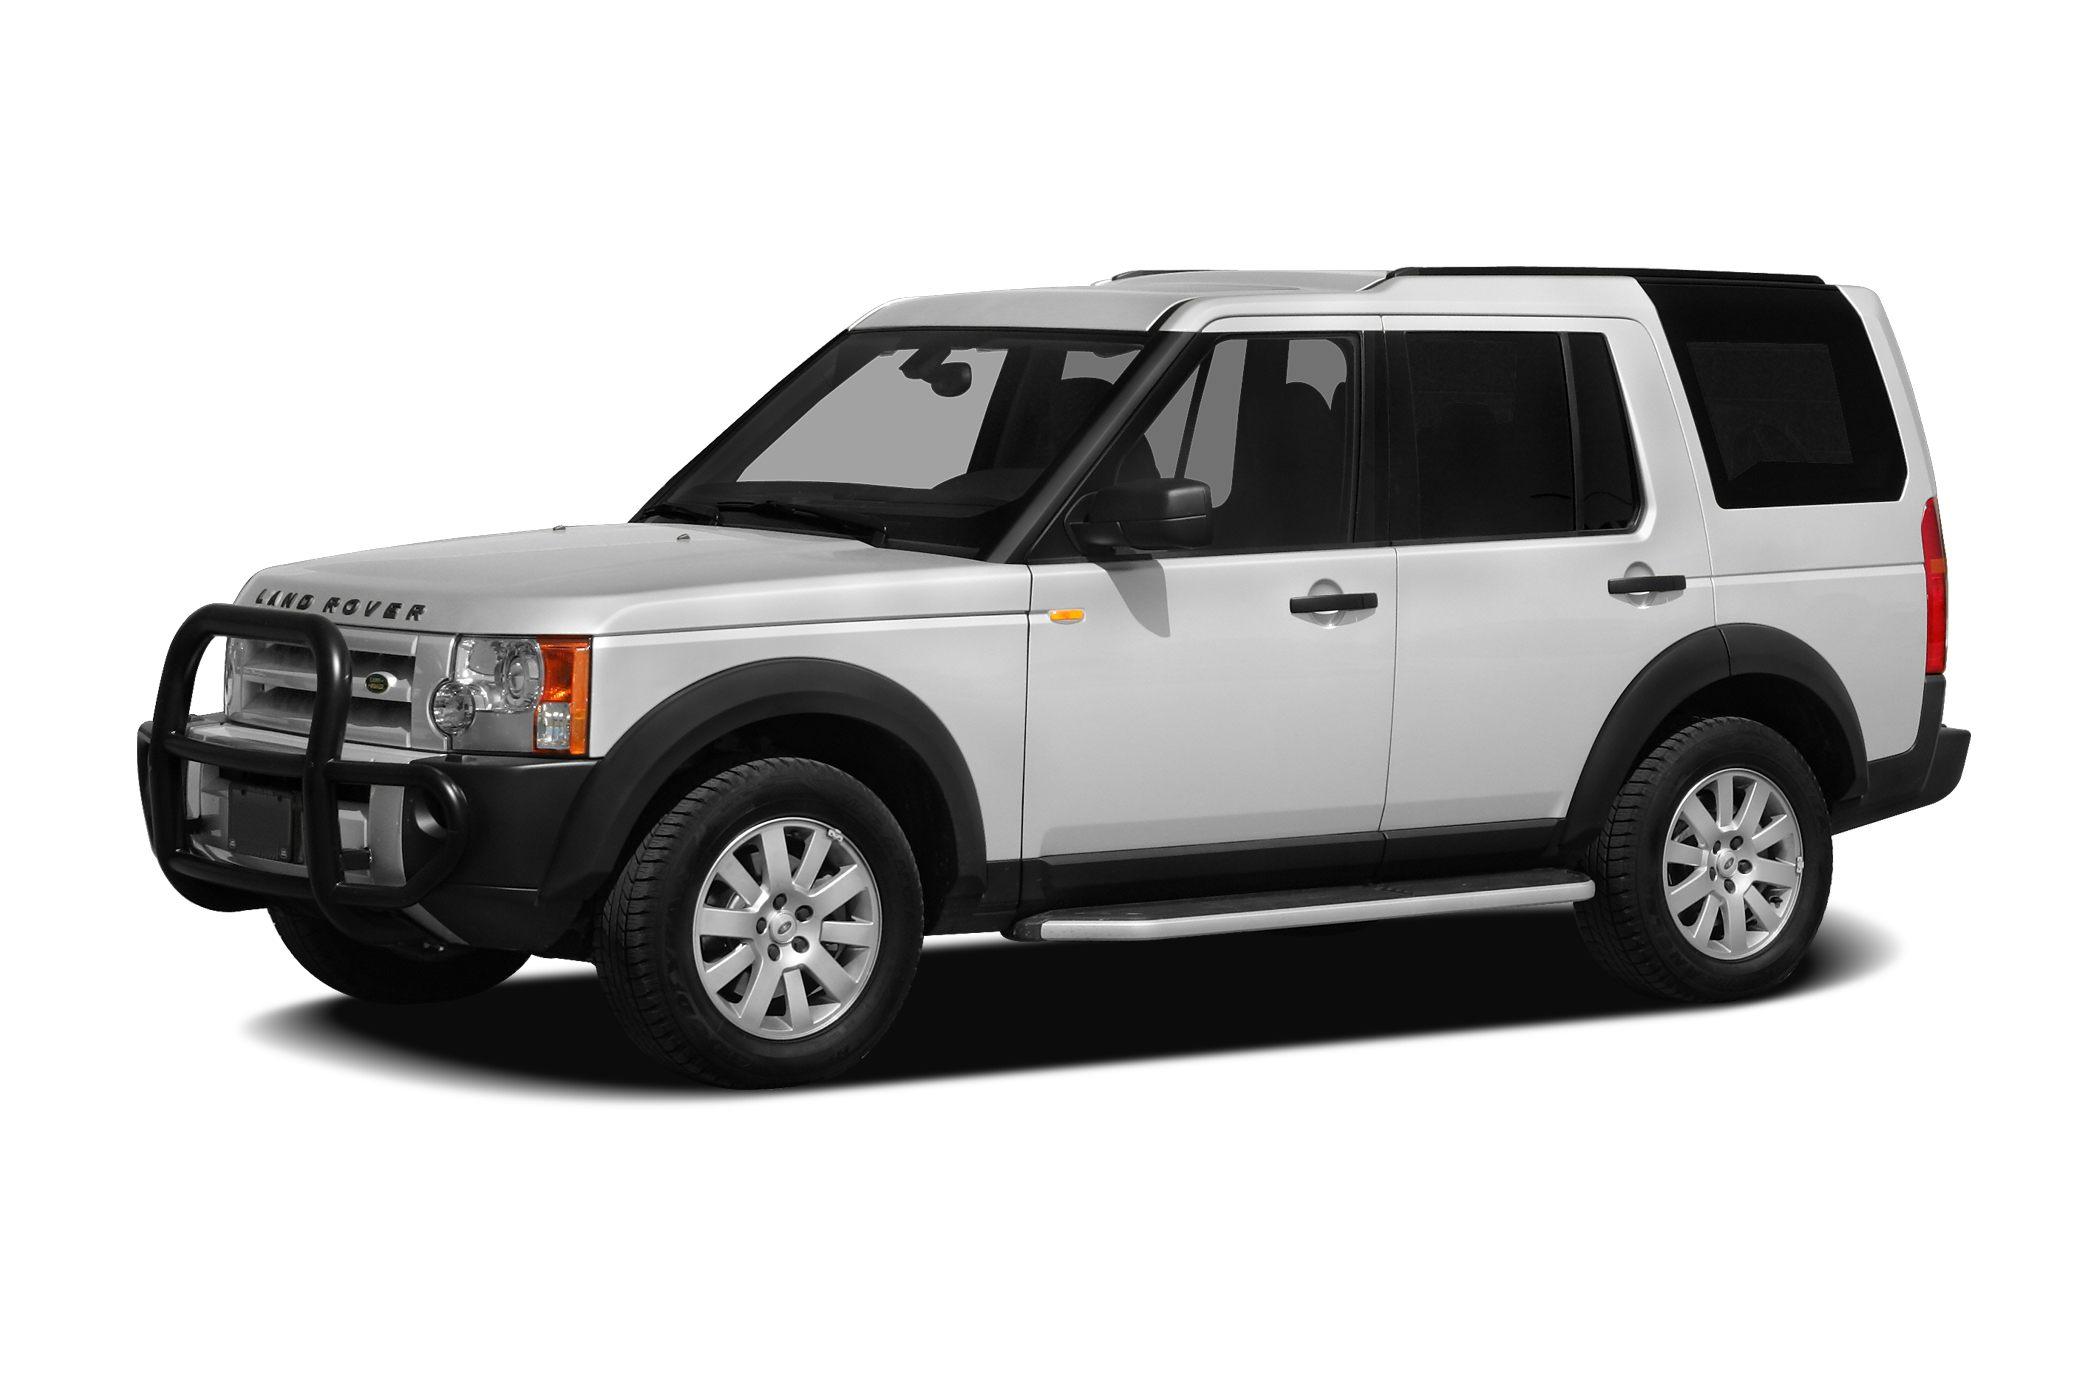 2008 Land Rover LR3 New Car Test Drive